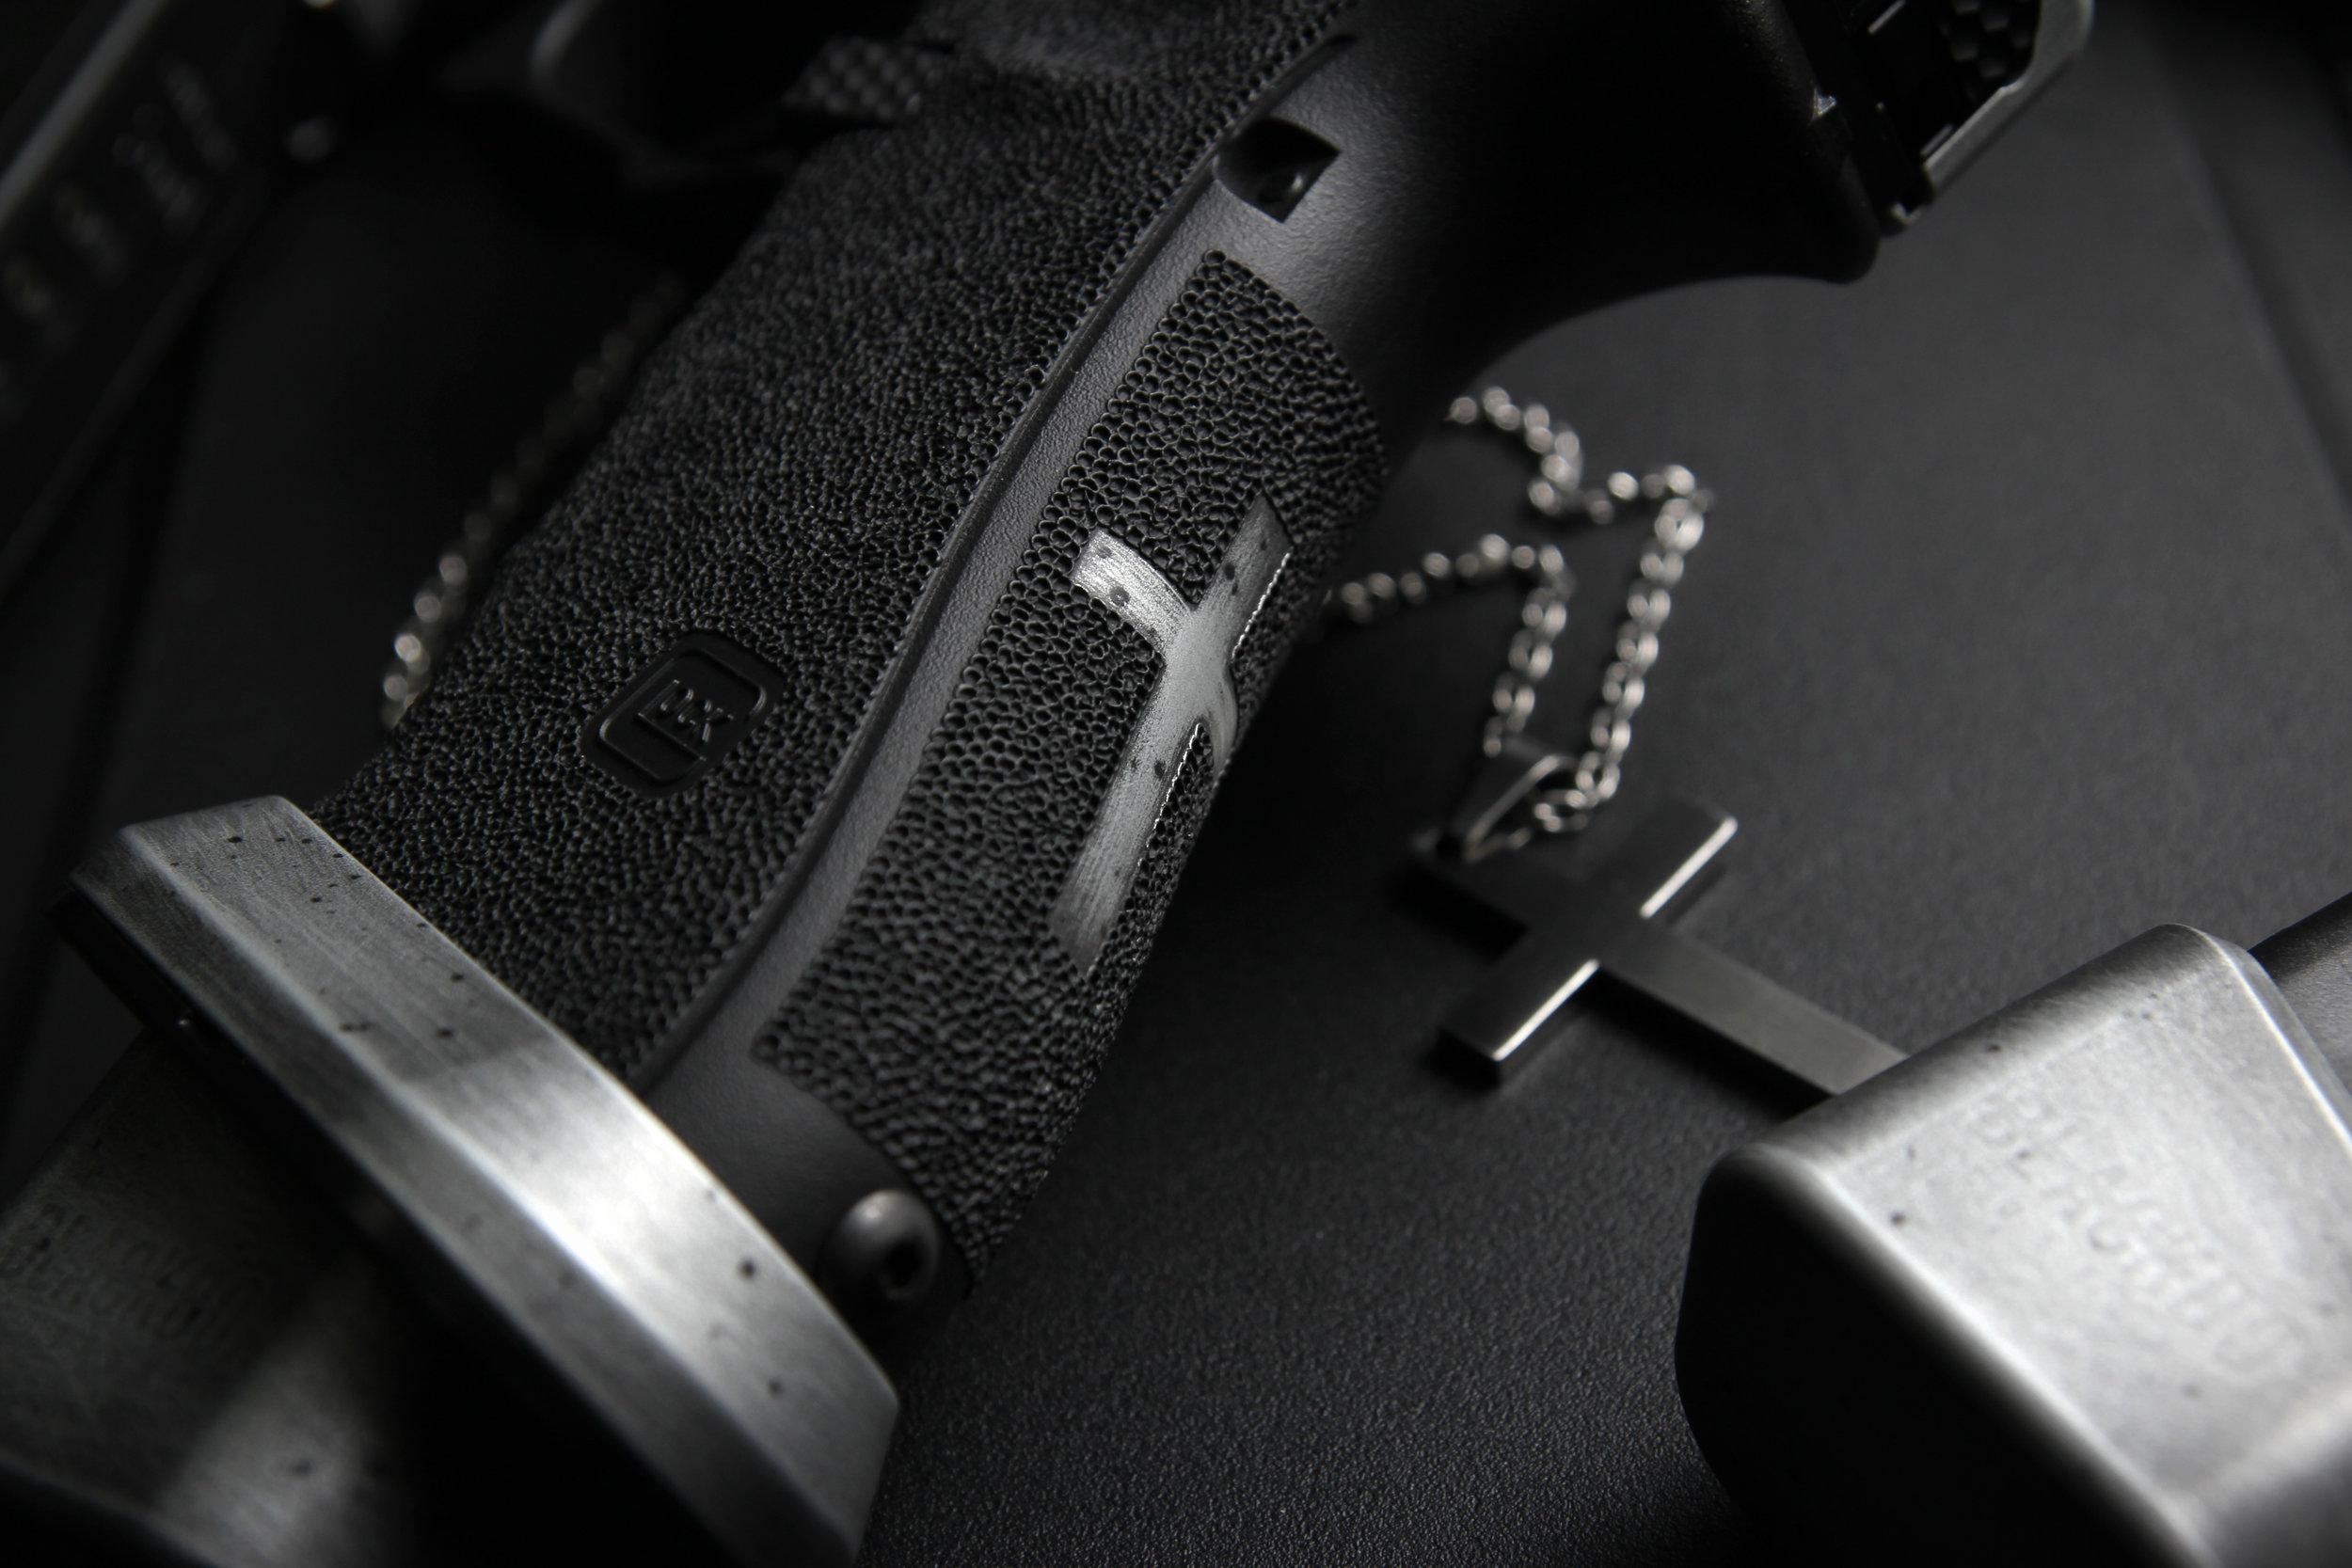 Glock 34 Cross black box customs